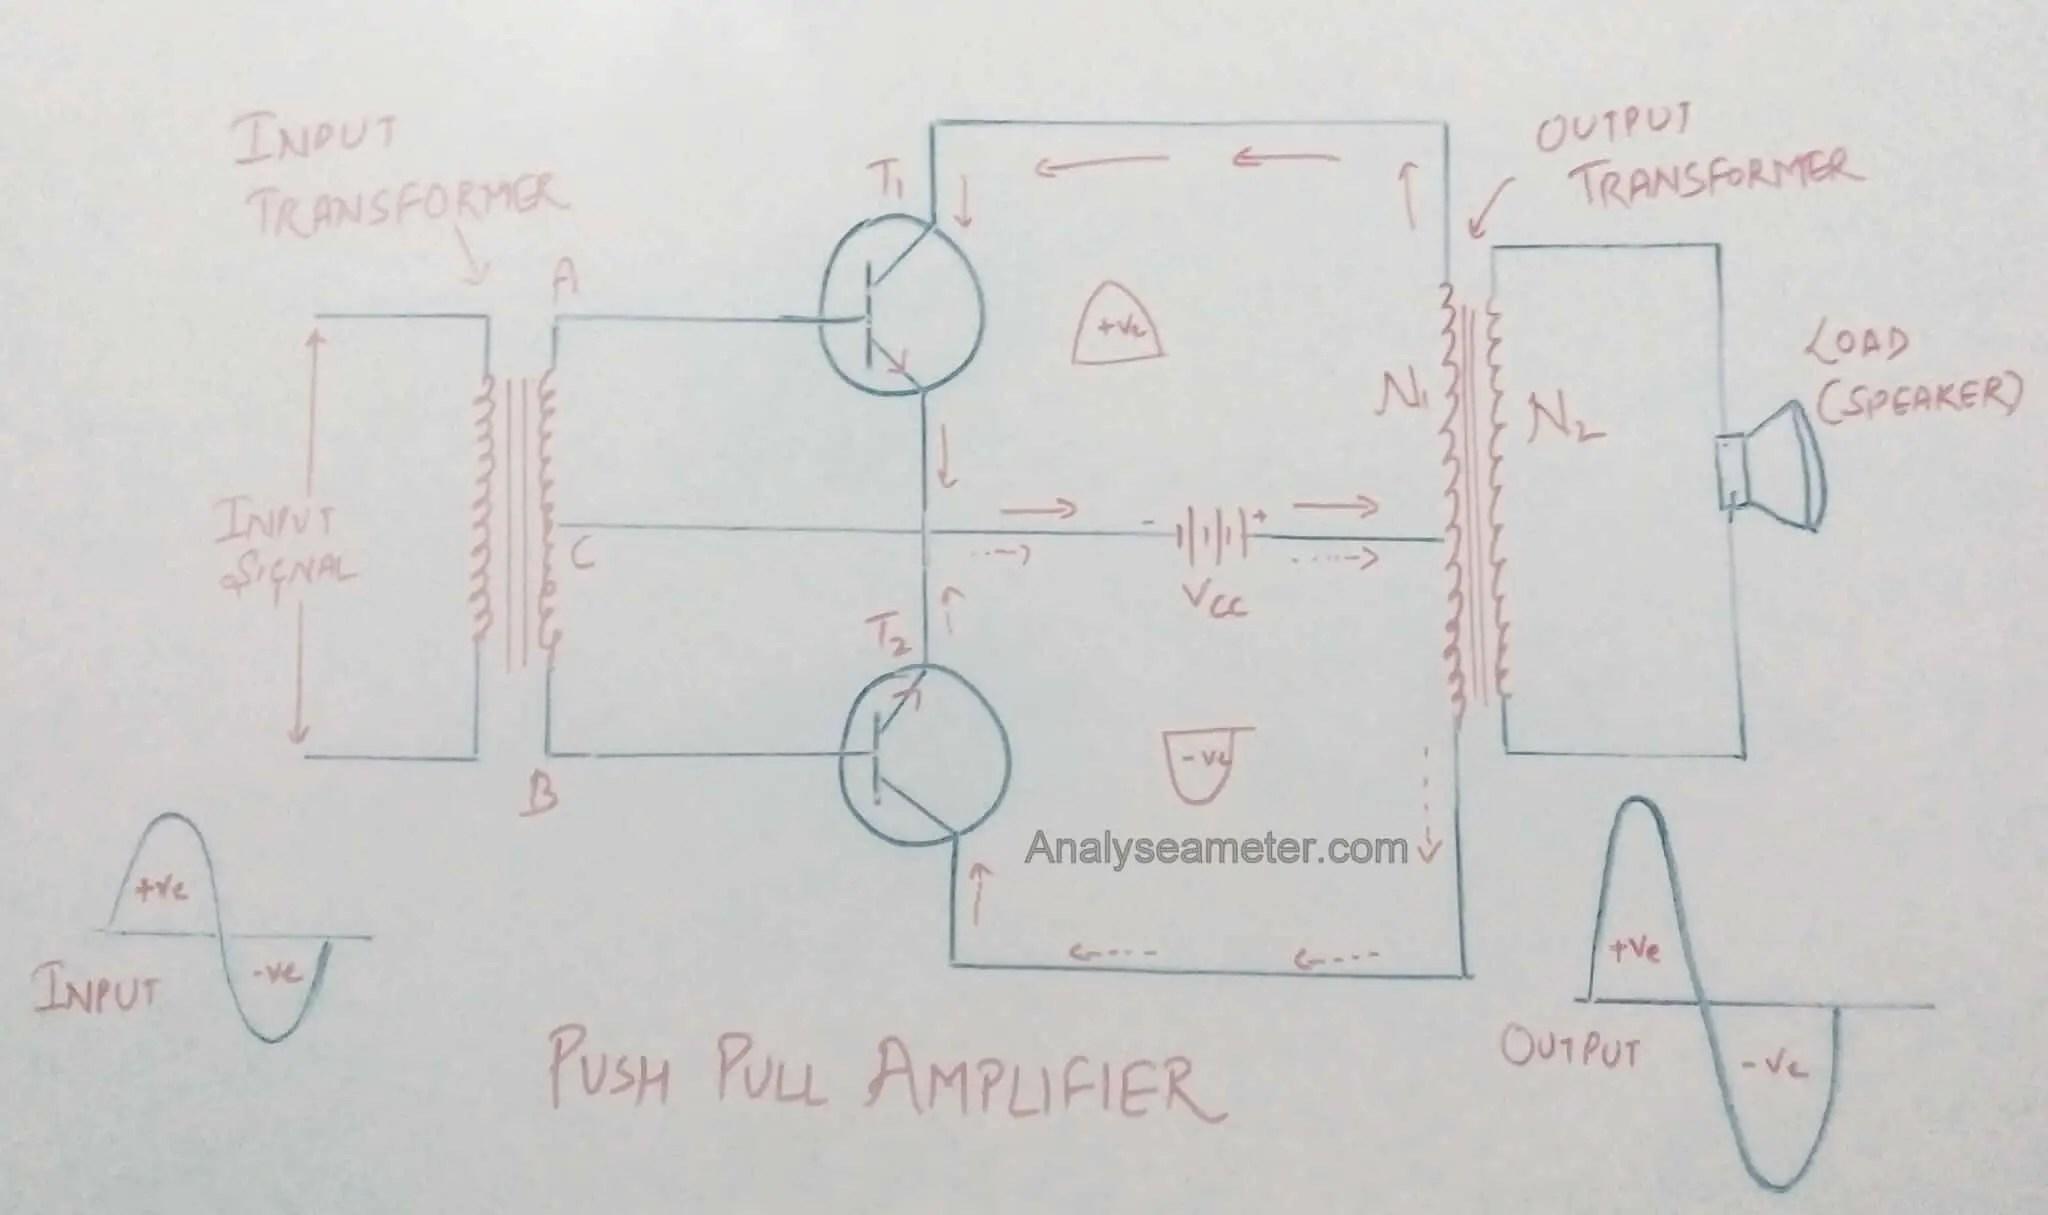 Class Ab Audio Amplifier Design A Circuit